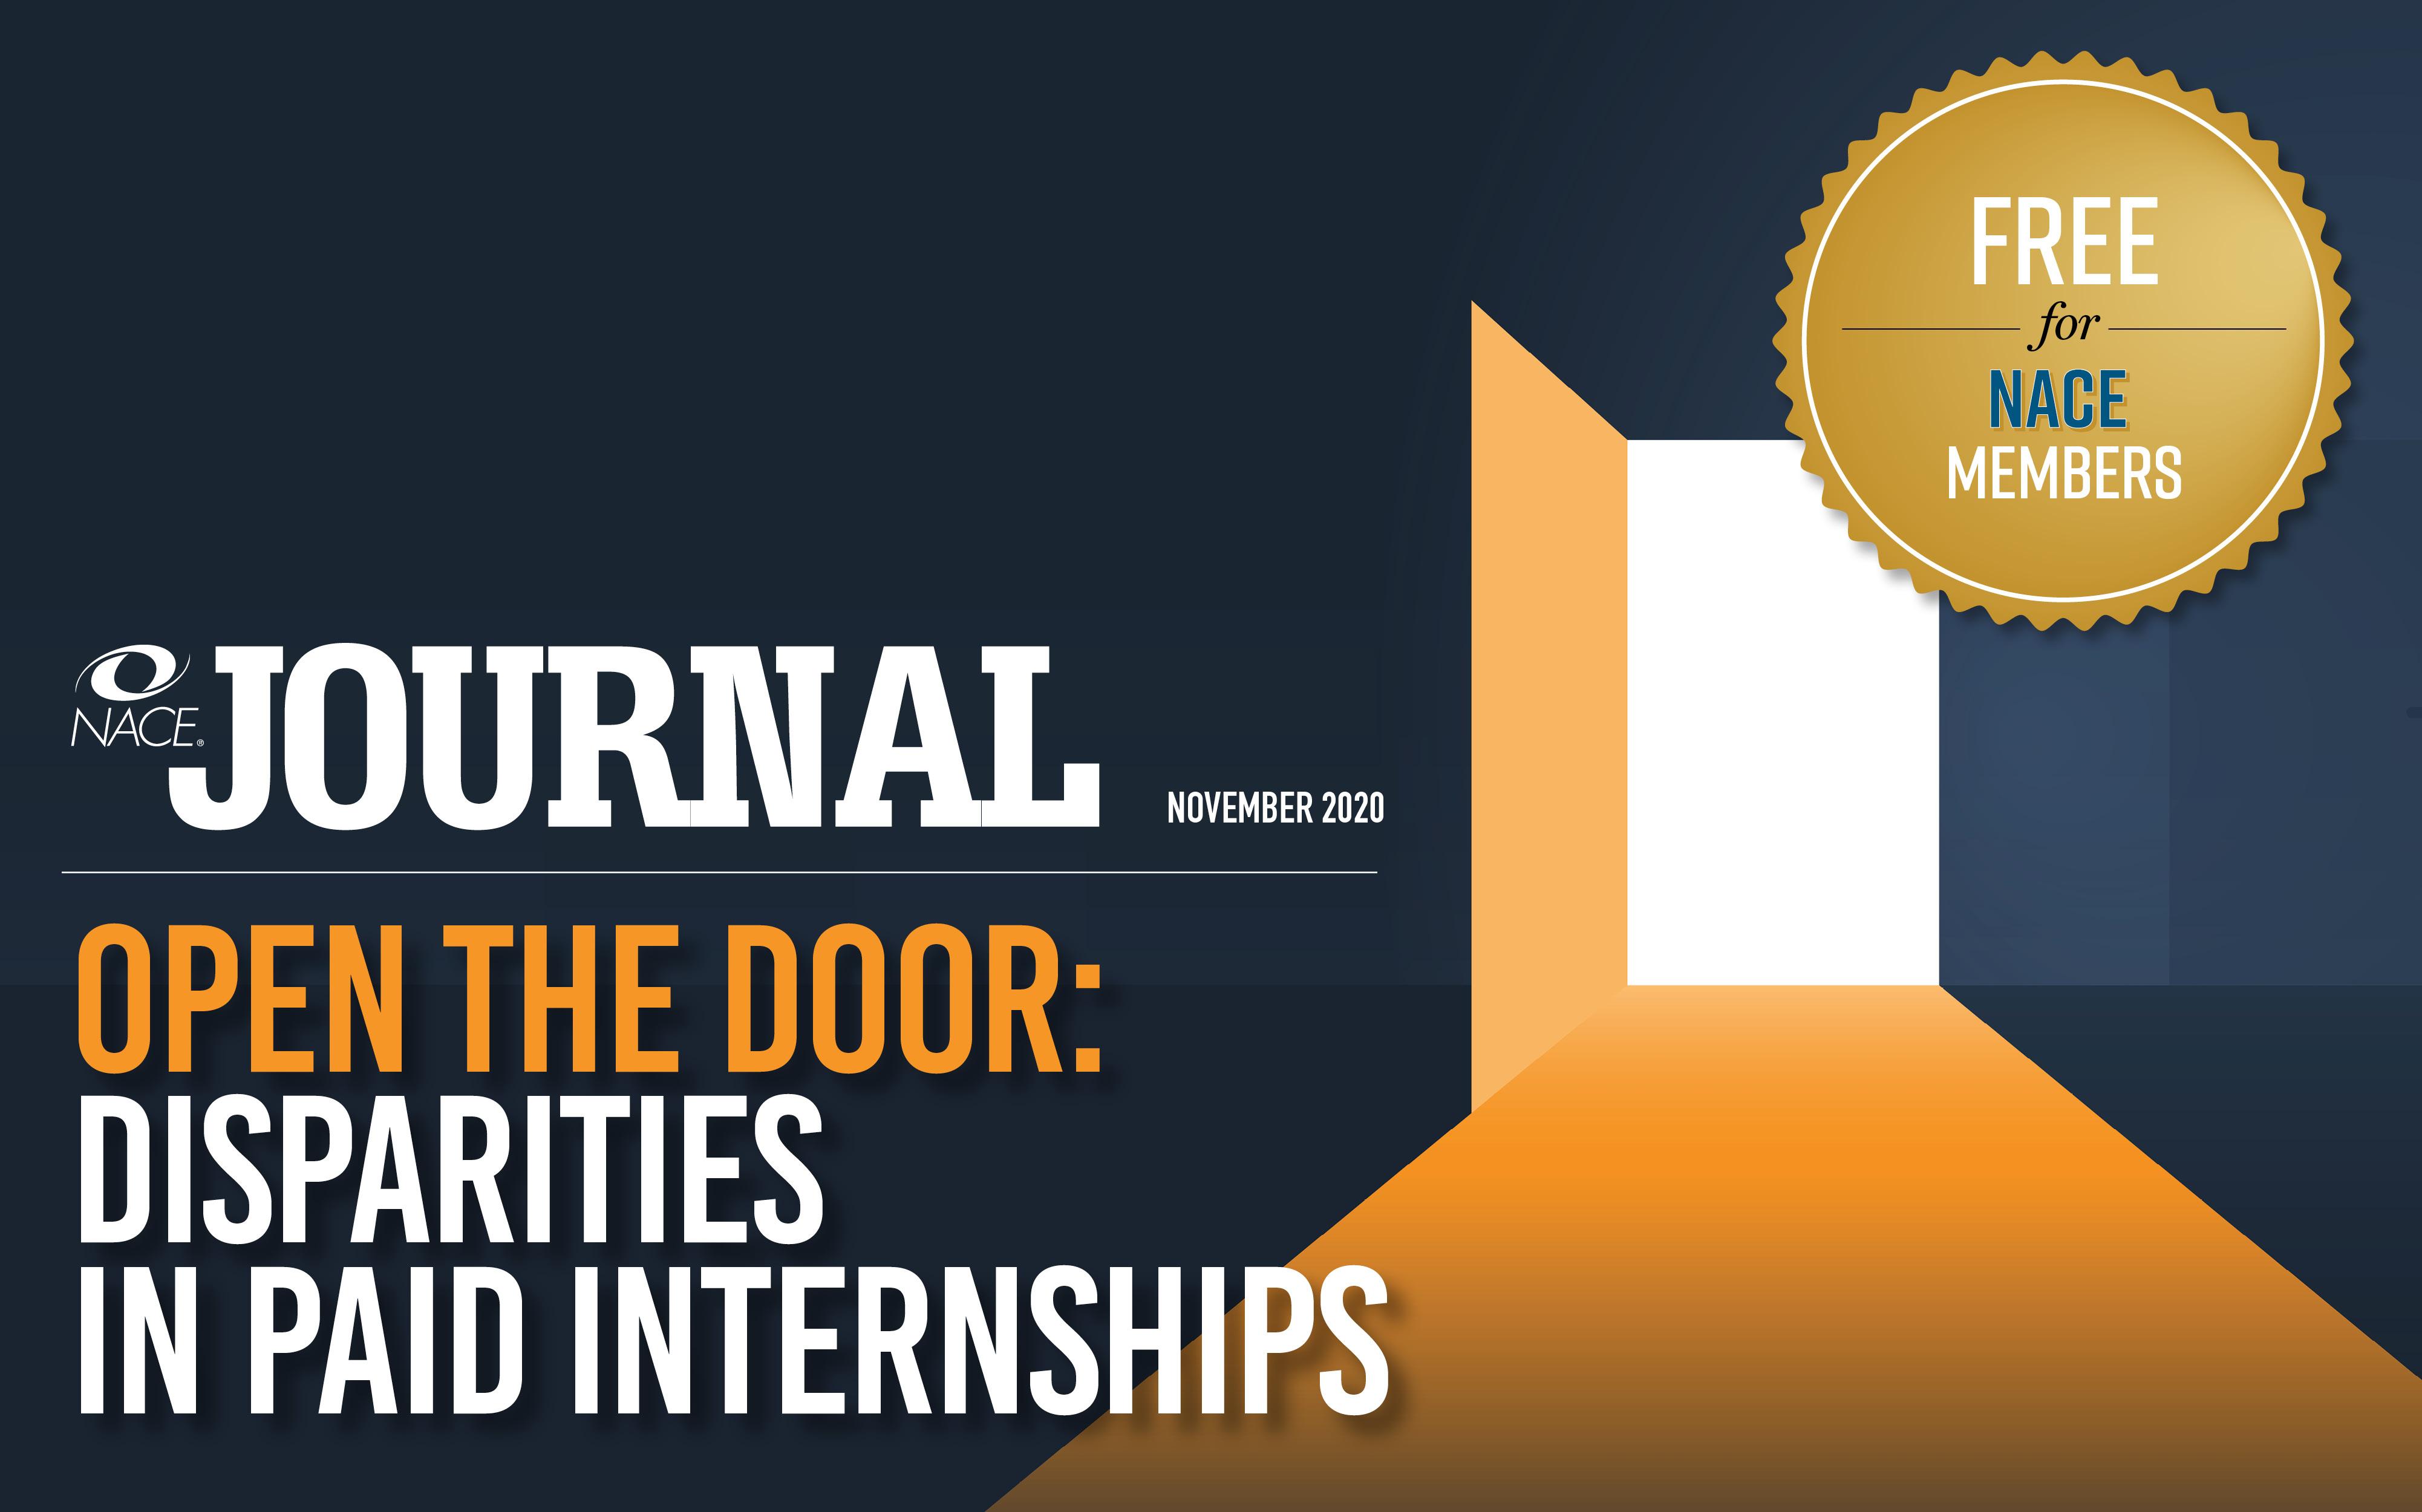 Journal Subscriber